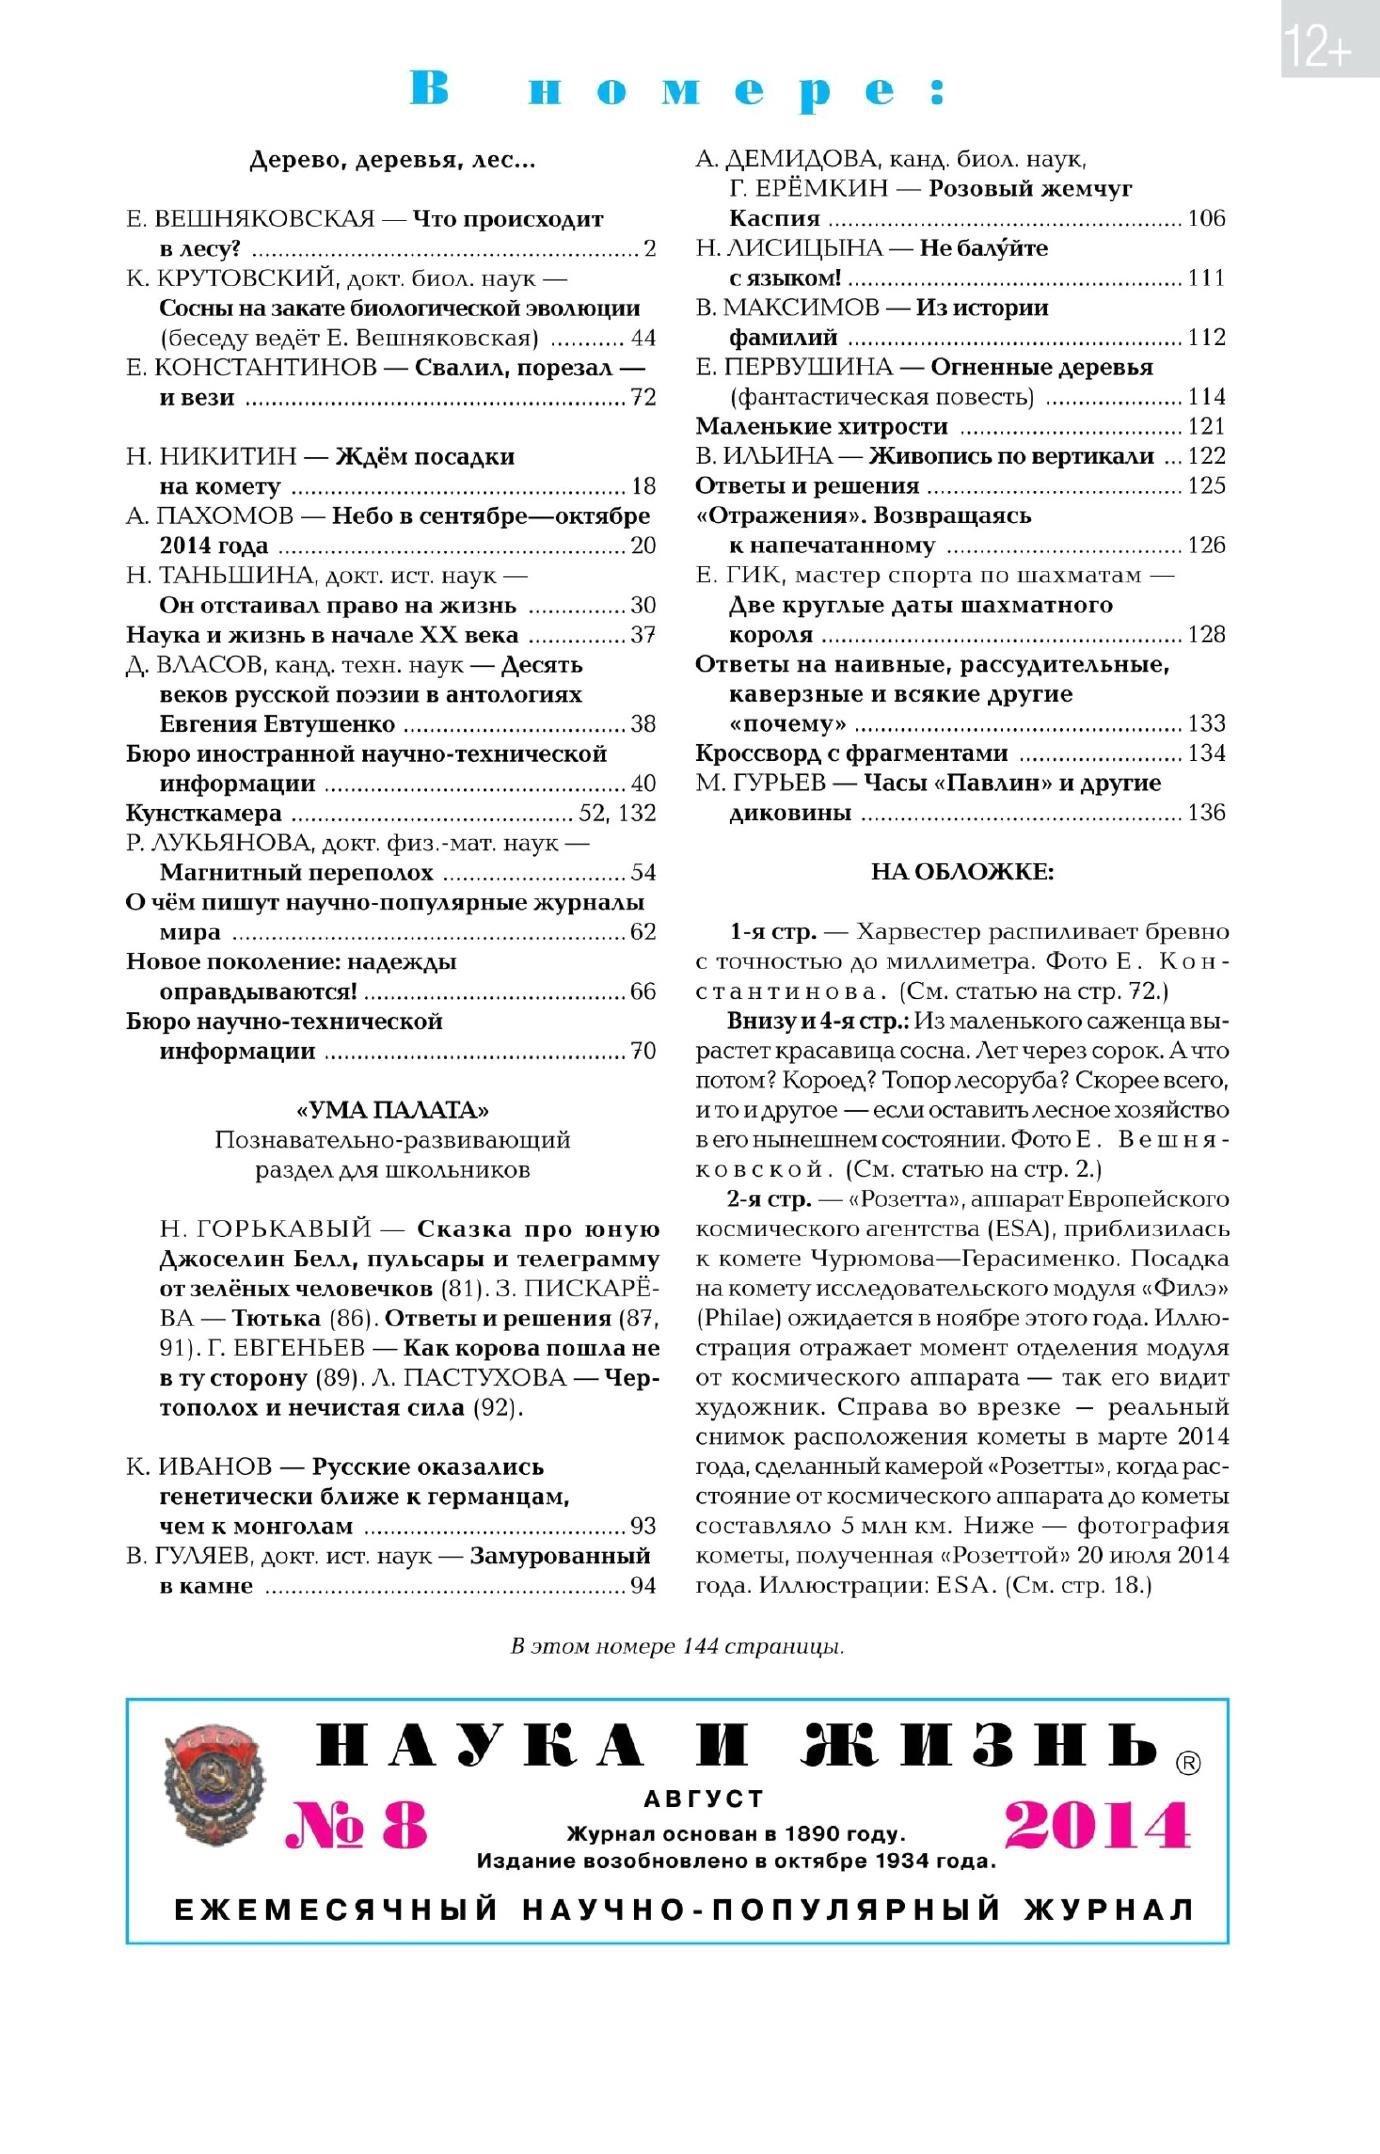 http://images.vfl.ru/ii/1407271086/8098243c/5909379.jpg